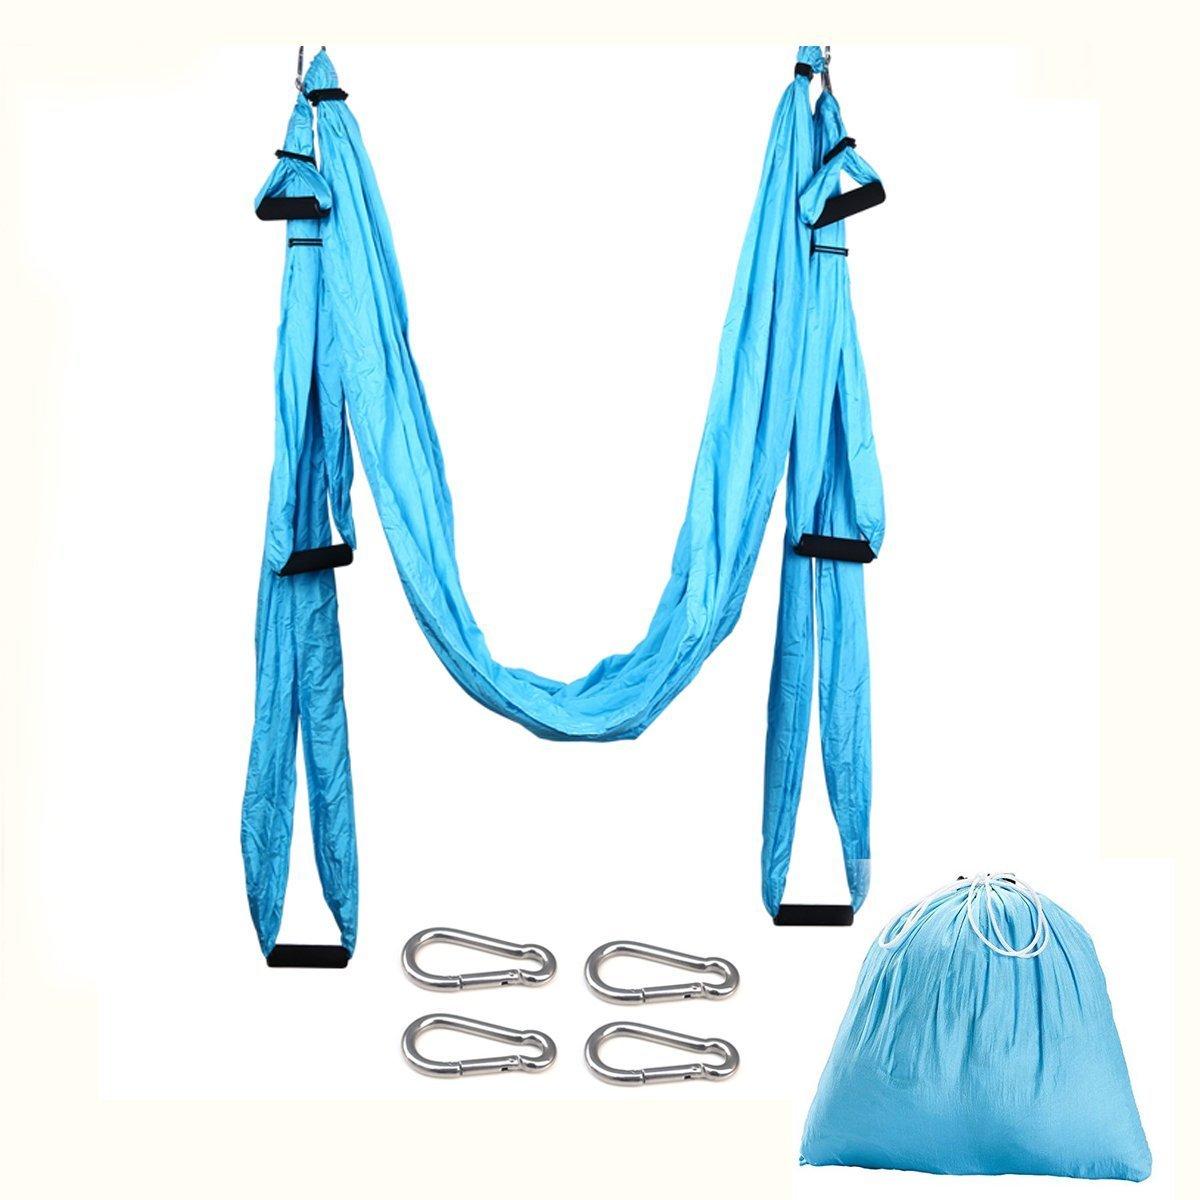 Budalga Yoga Swing Sling Trapeze Inversion Equipment Flying Yoga Hammock Anti-Gravity by Budalga (Image #2)